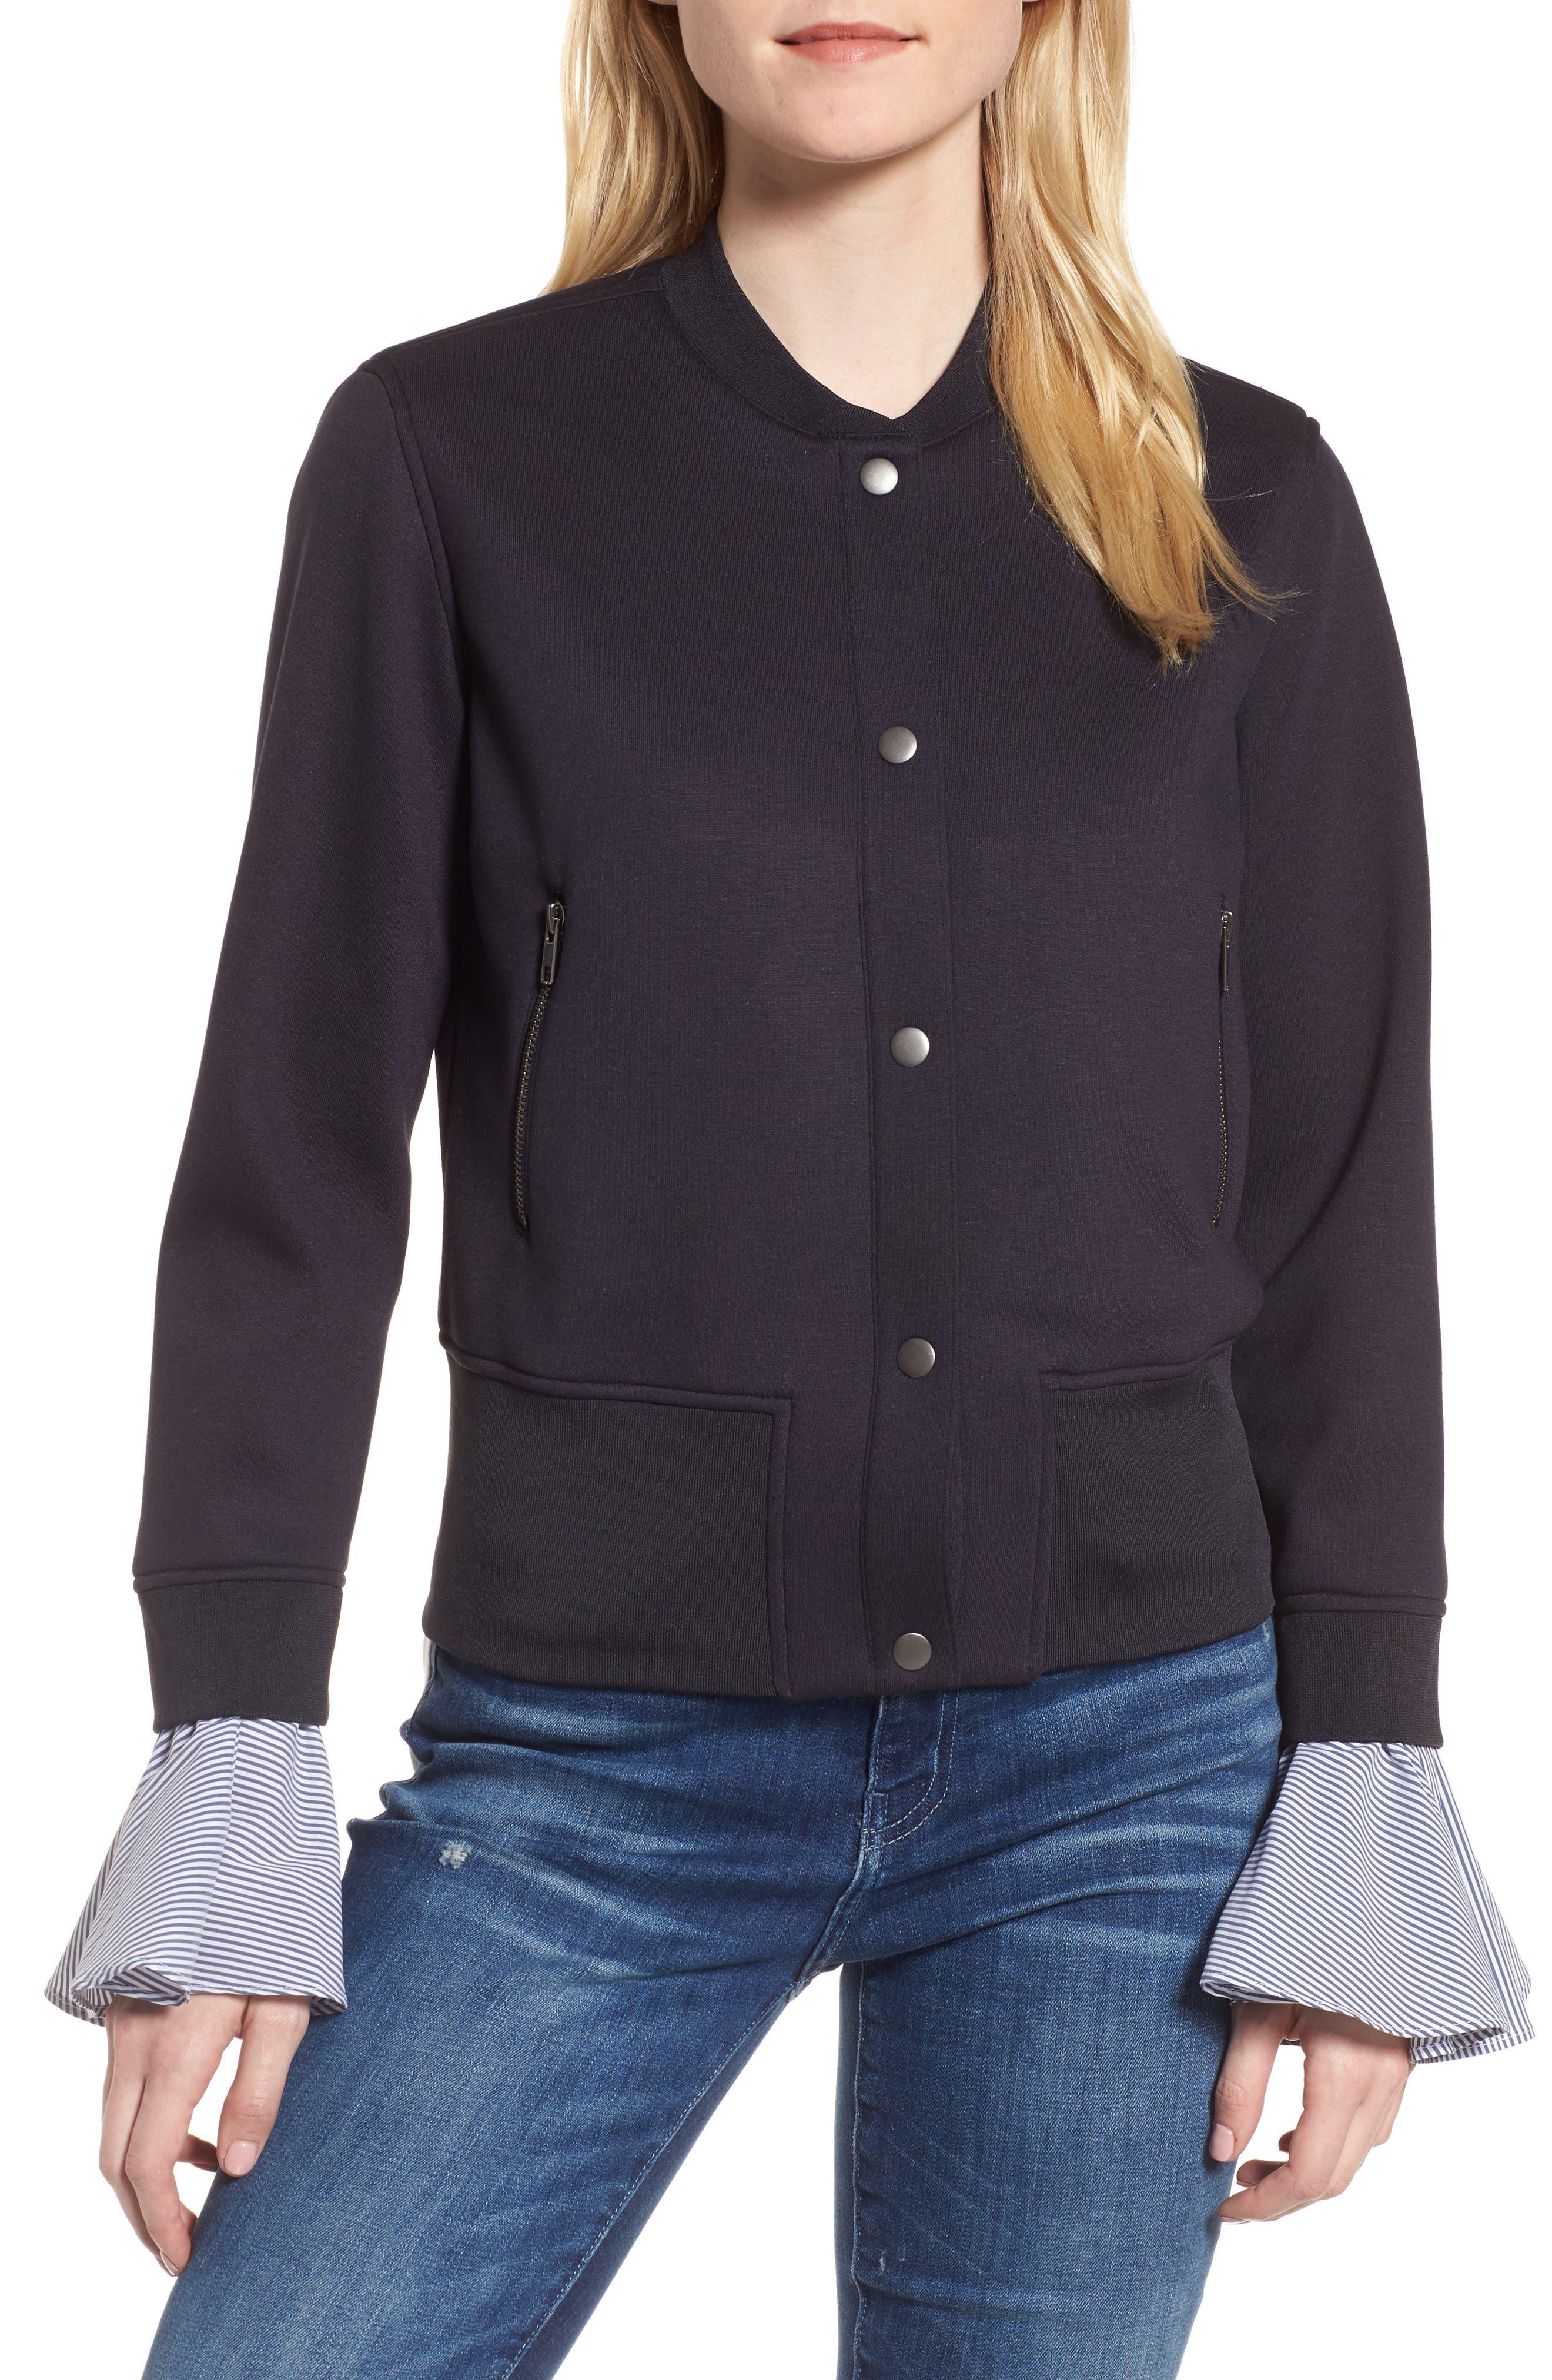 Ruffle Sleeve Jacket,                         Main,                         color, Navy Well